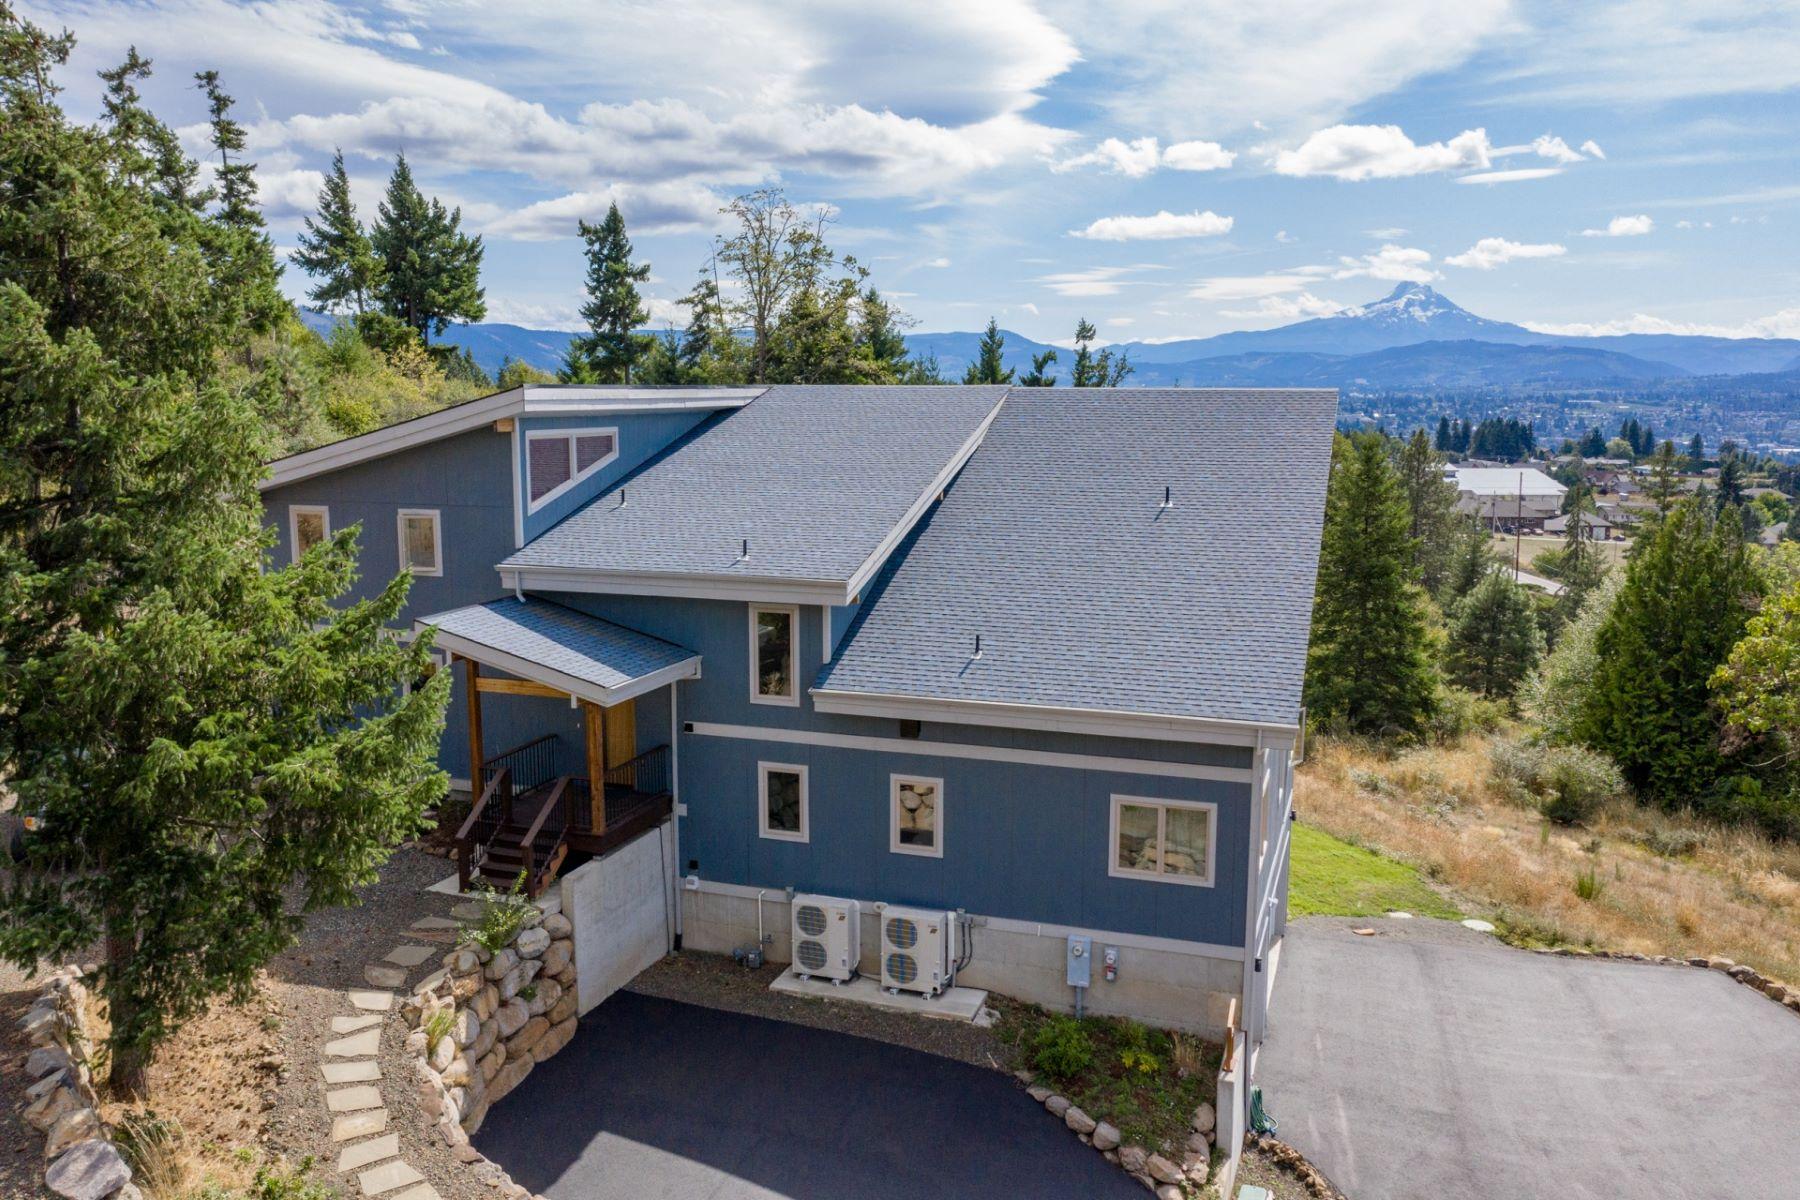 Single Family Homes for Sale at 1455 Catilina Lane 1455 Catalina Lane White Salmon, Washington 98672 United States